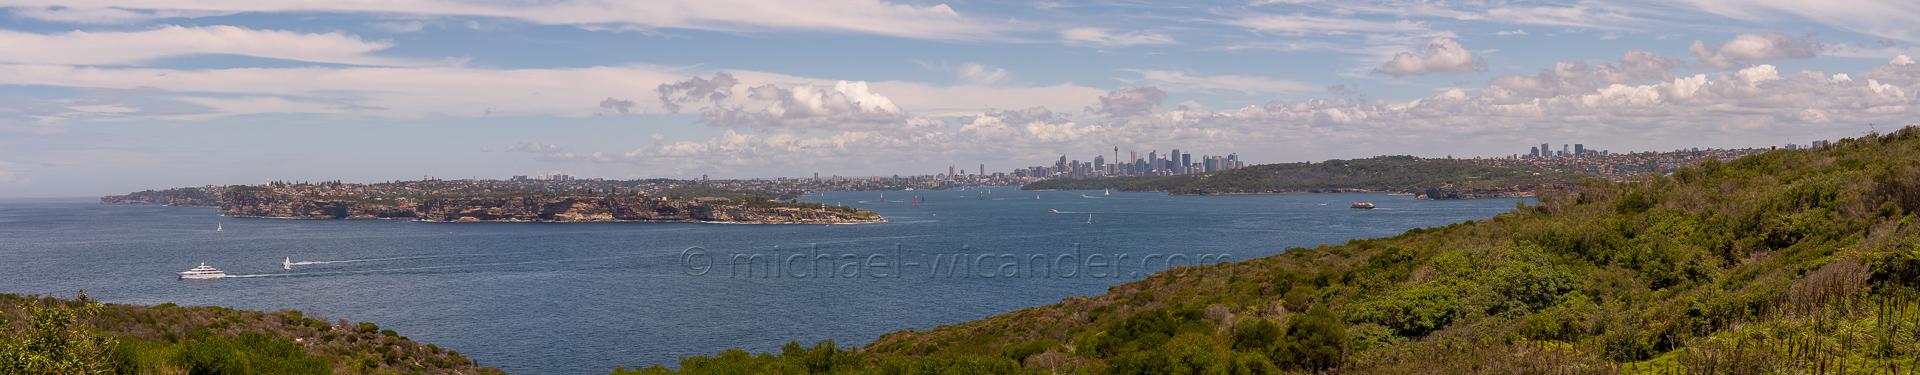 Sydney Skyline Panorama 19 12